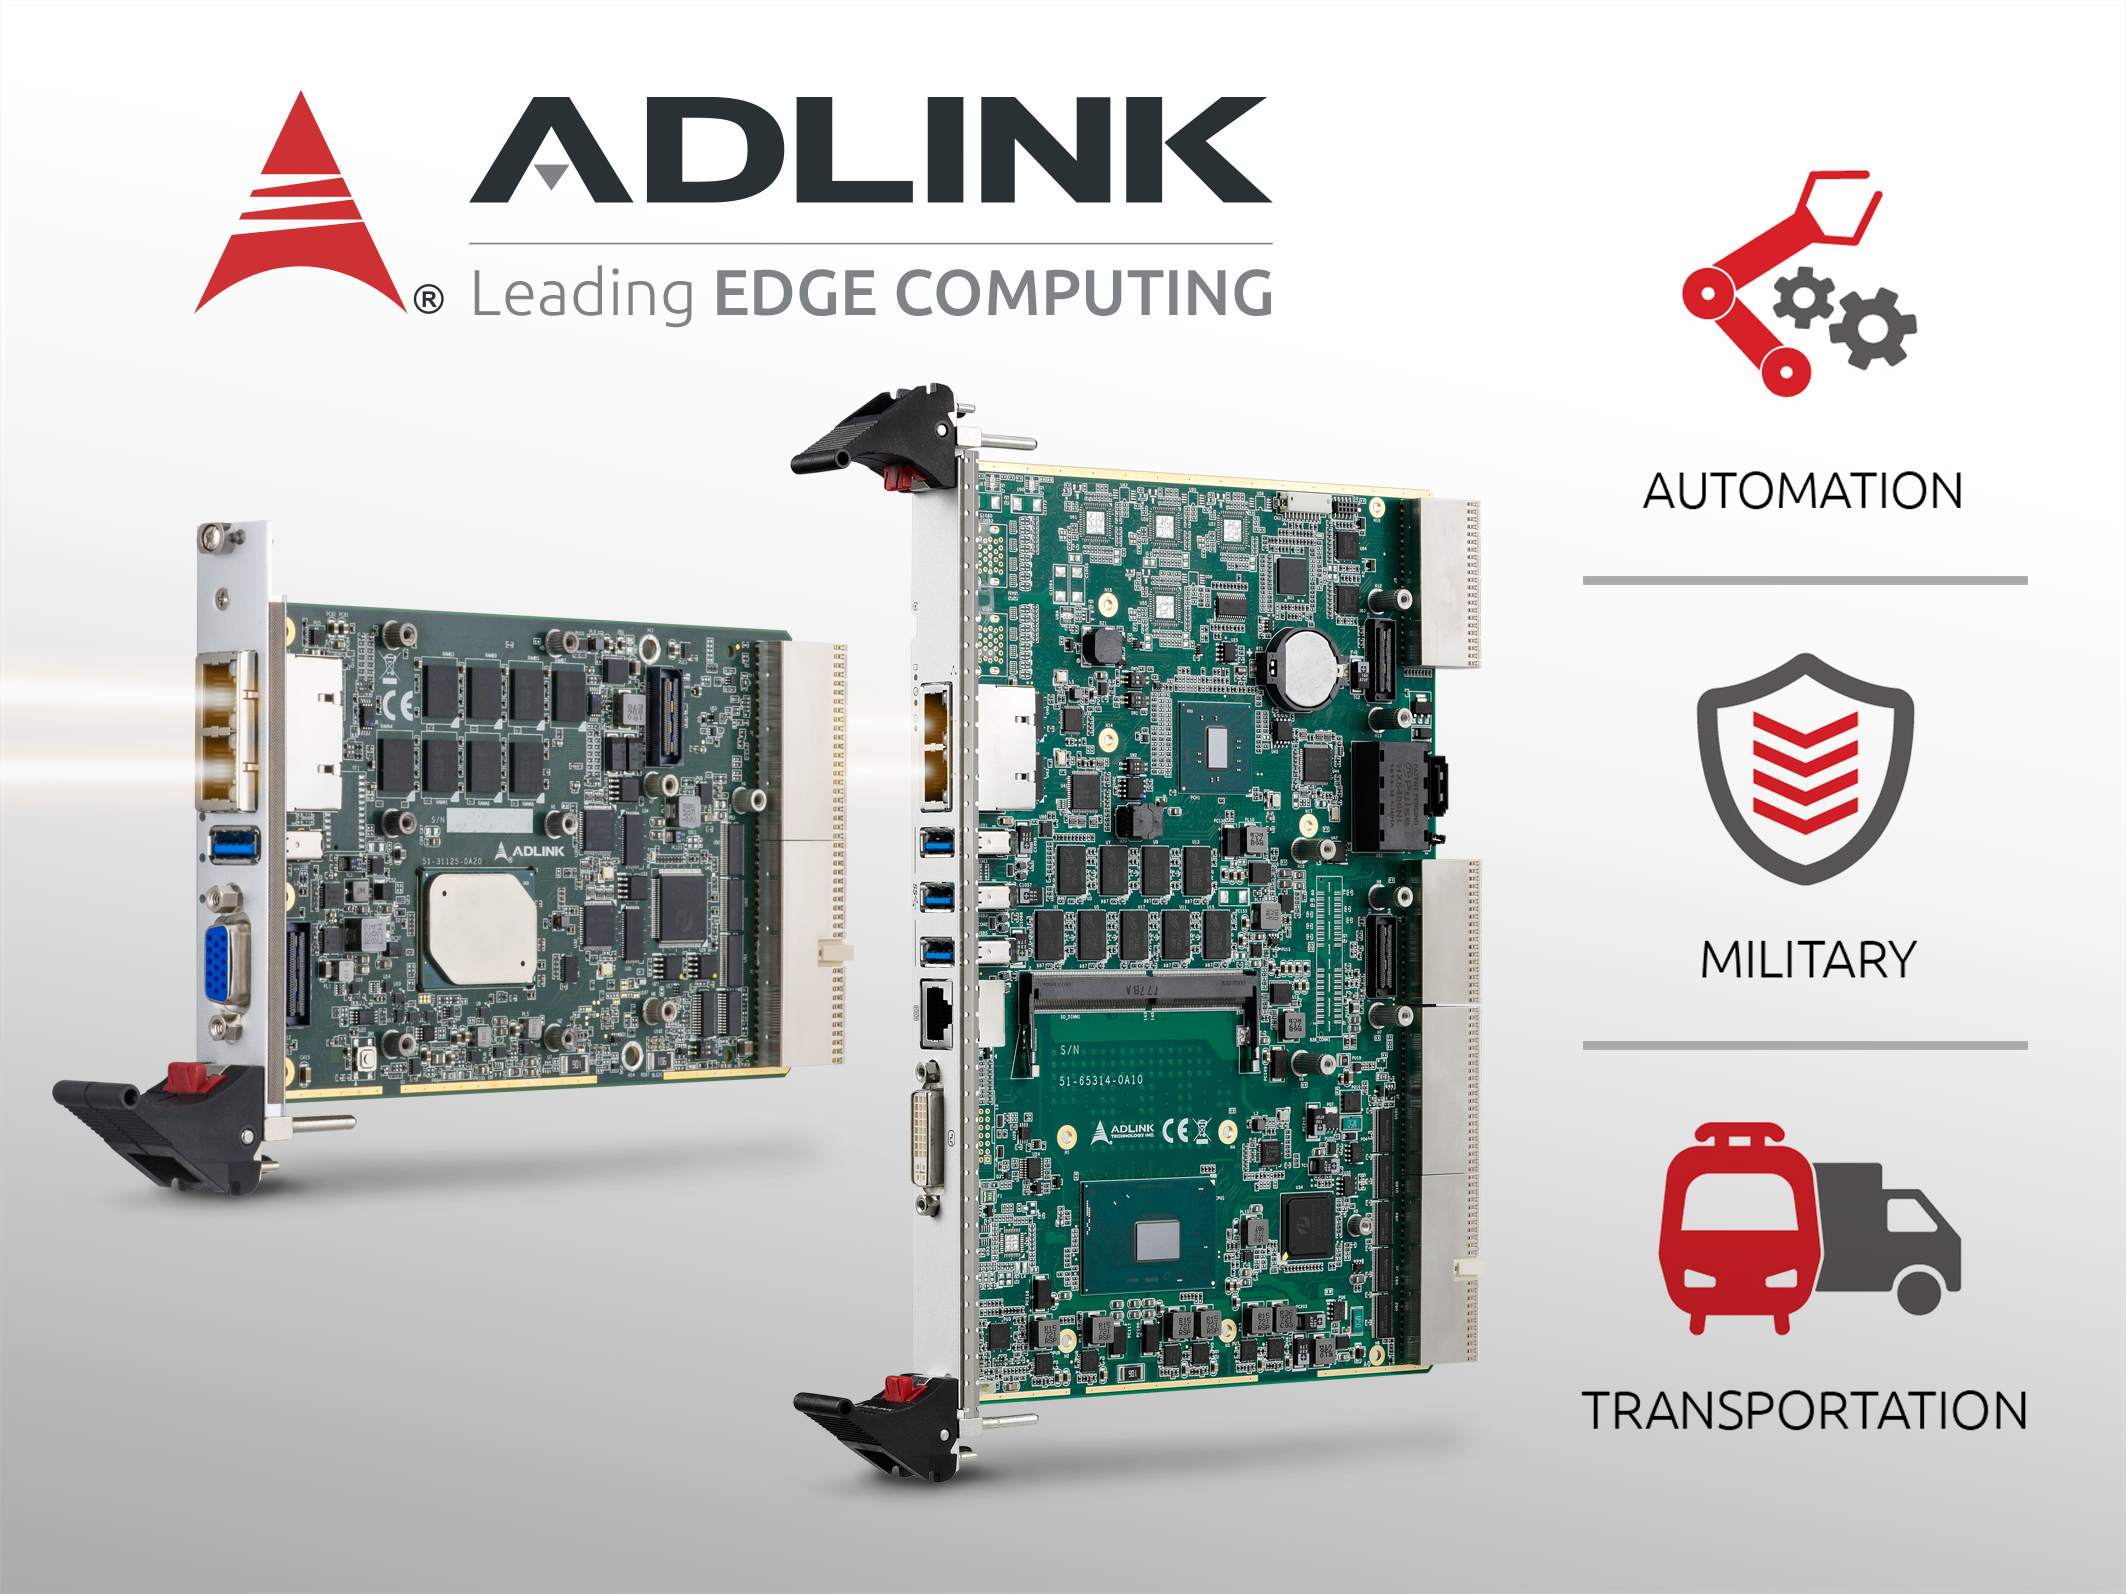 ADLINK_PR_cPCI-3630_cPCI-6636